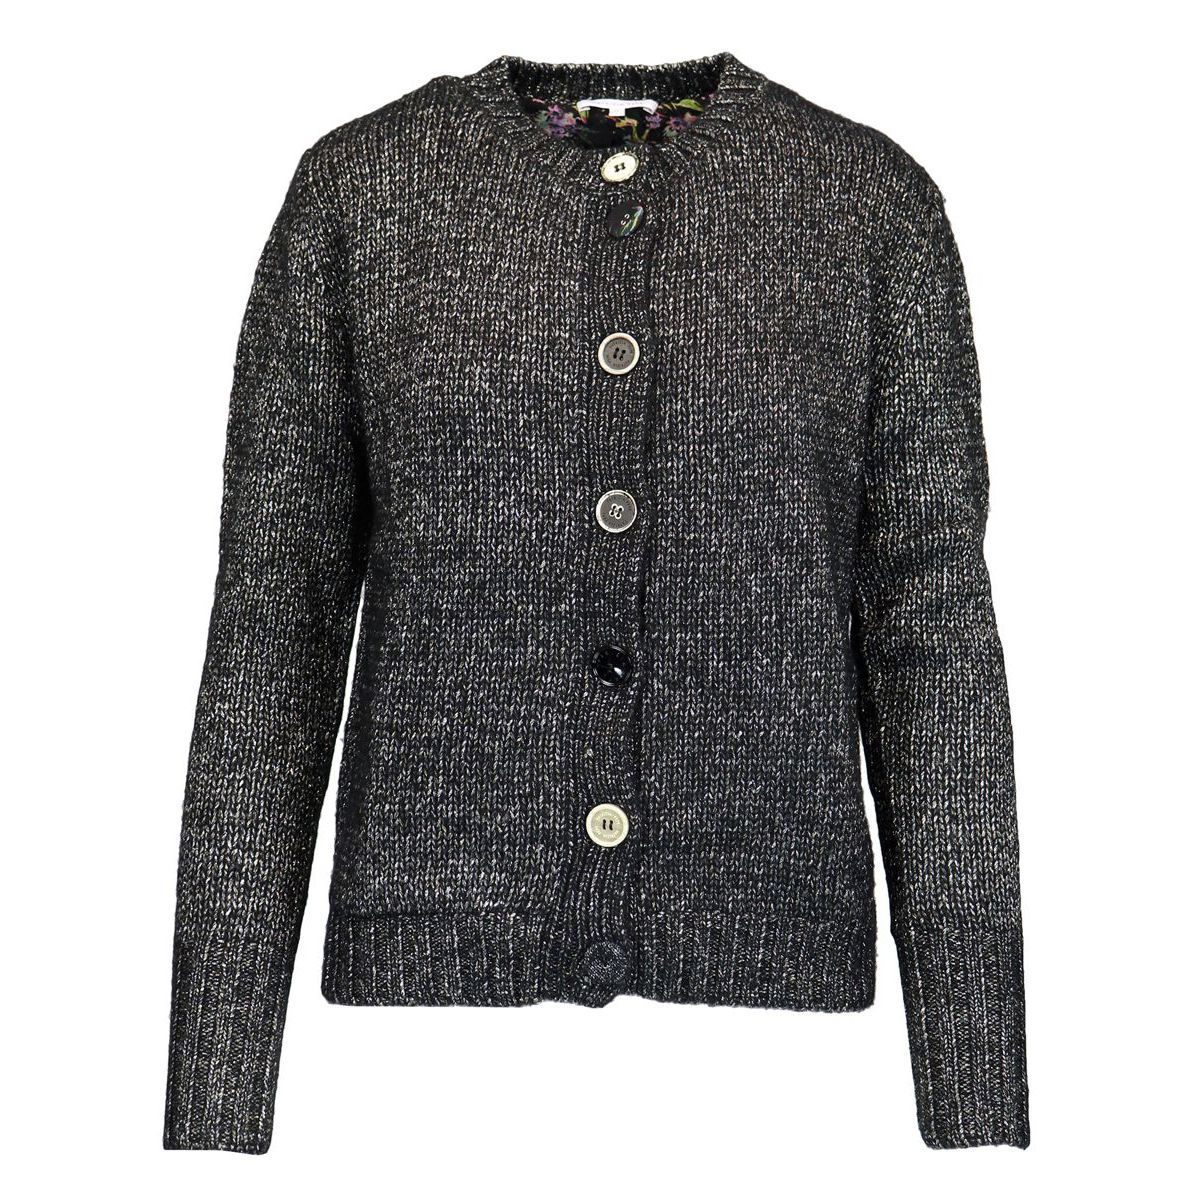 Buttoned shirt in lurex-effect wool blend Black Patrizia Pepe